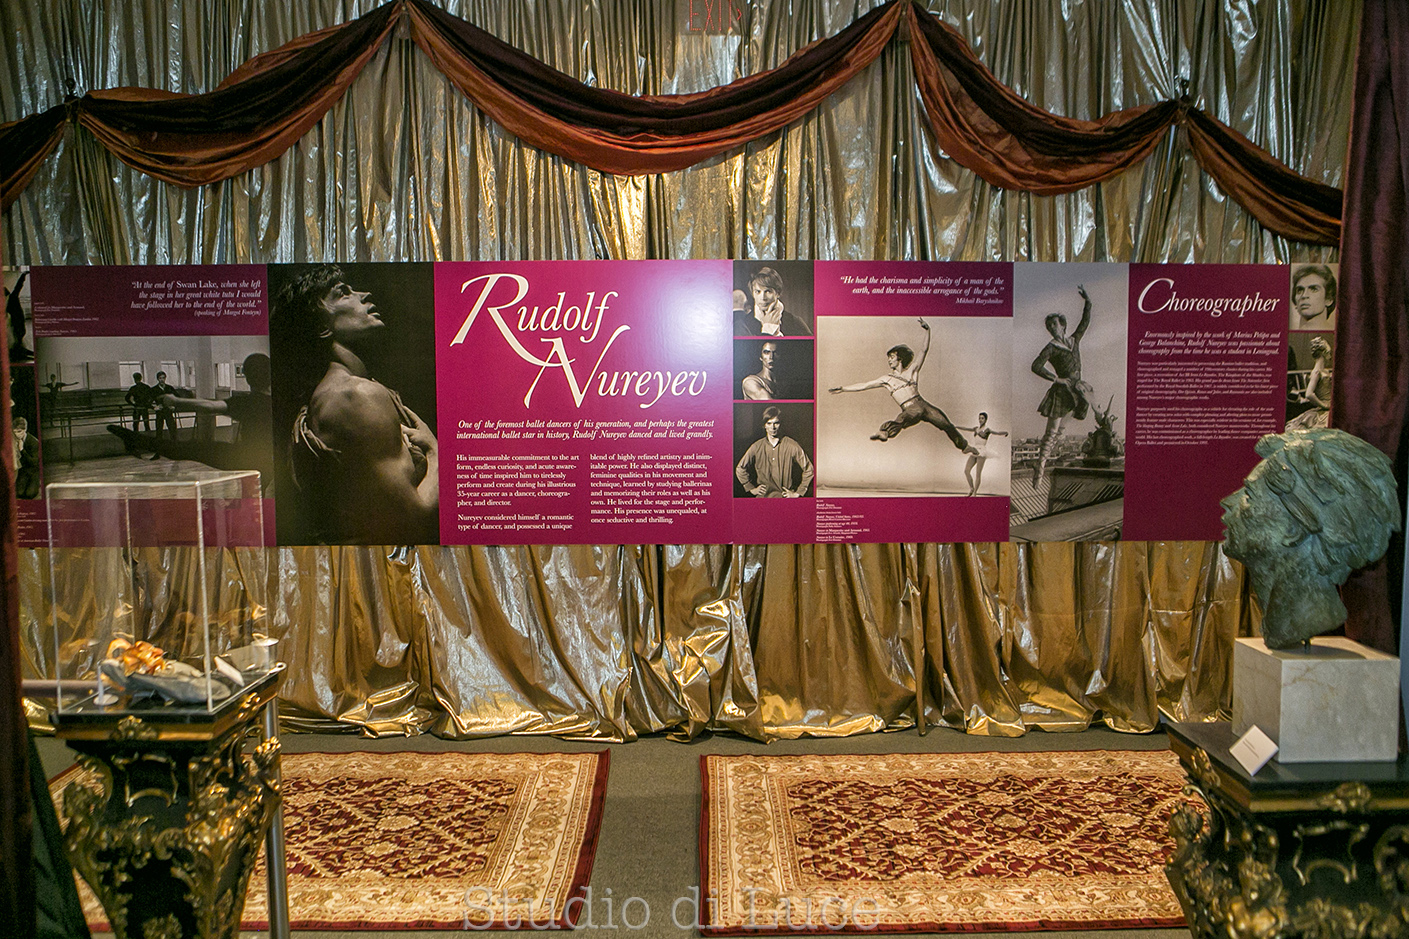 Museum of Dance Nureyev